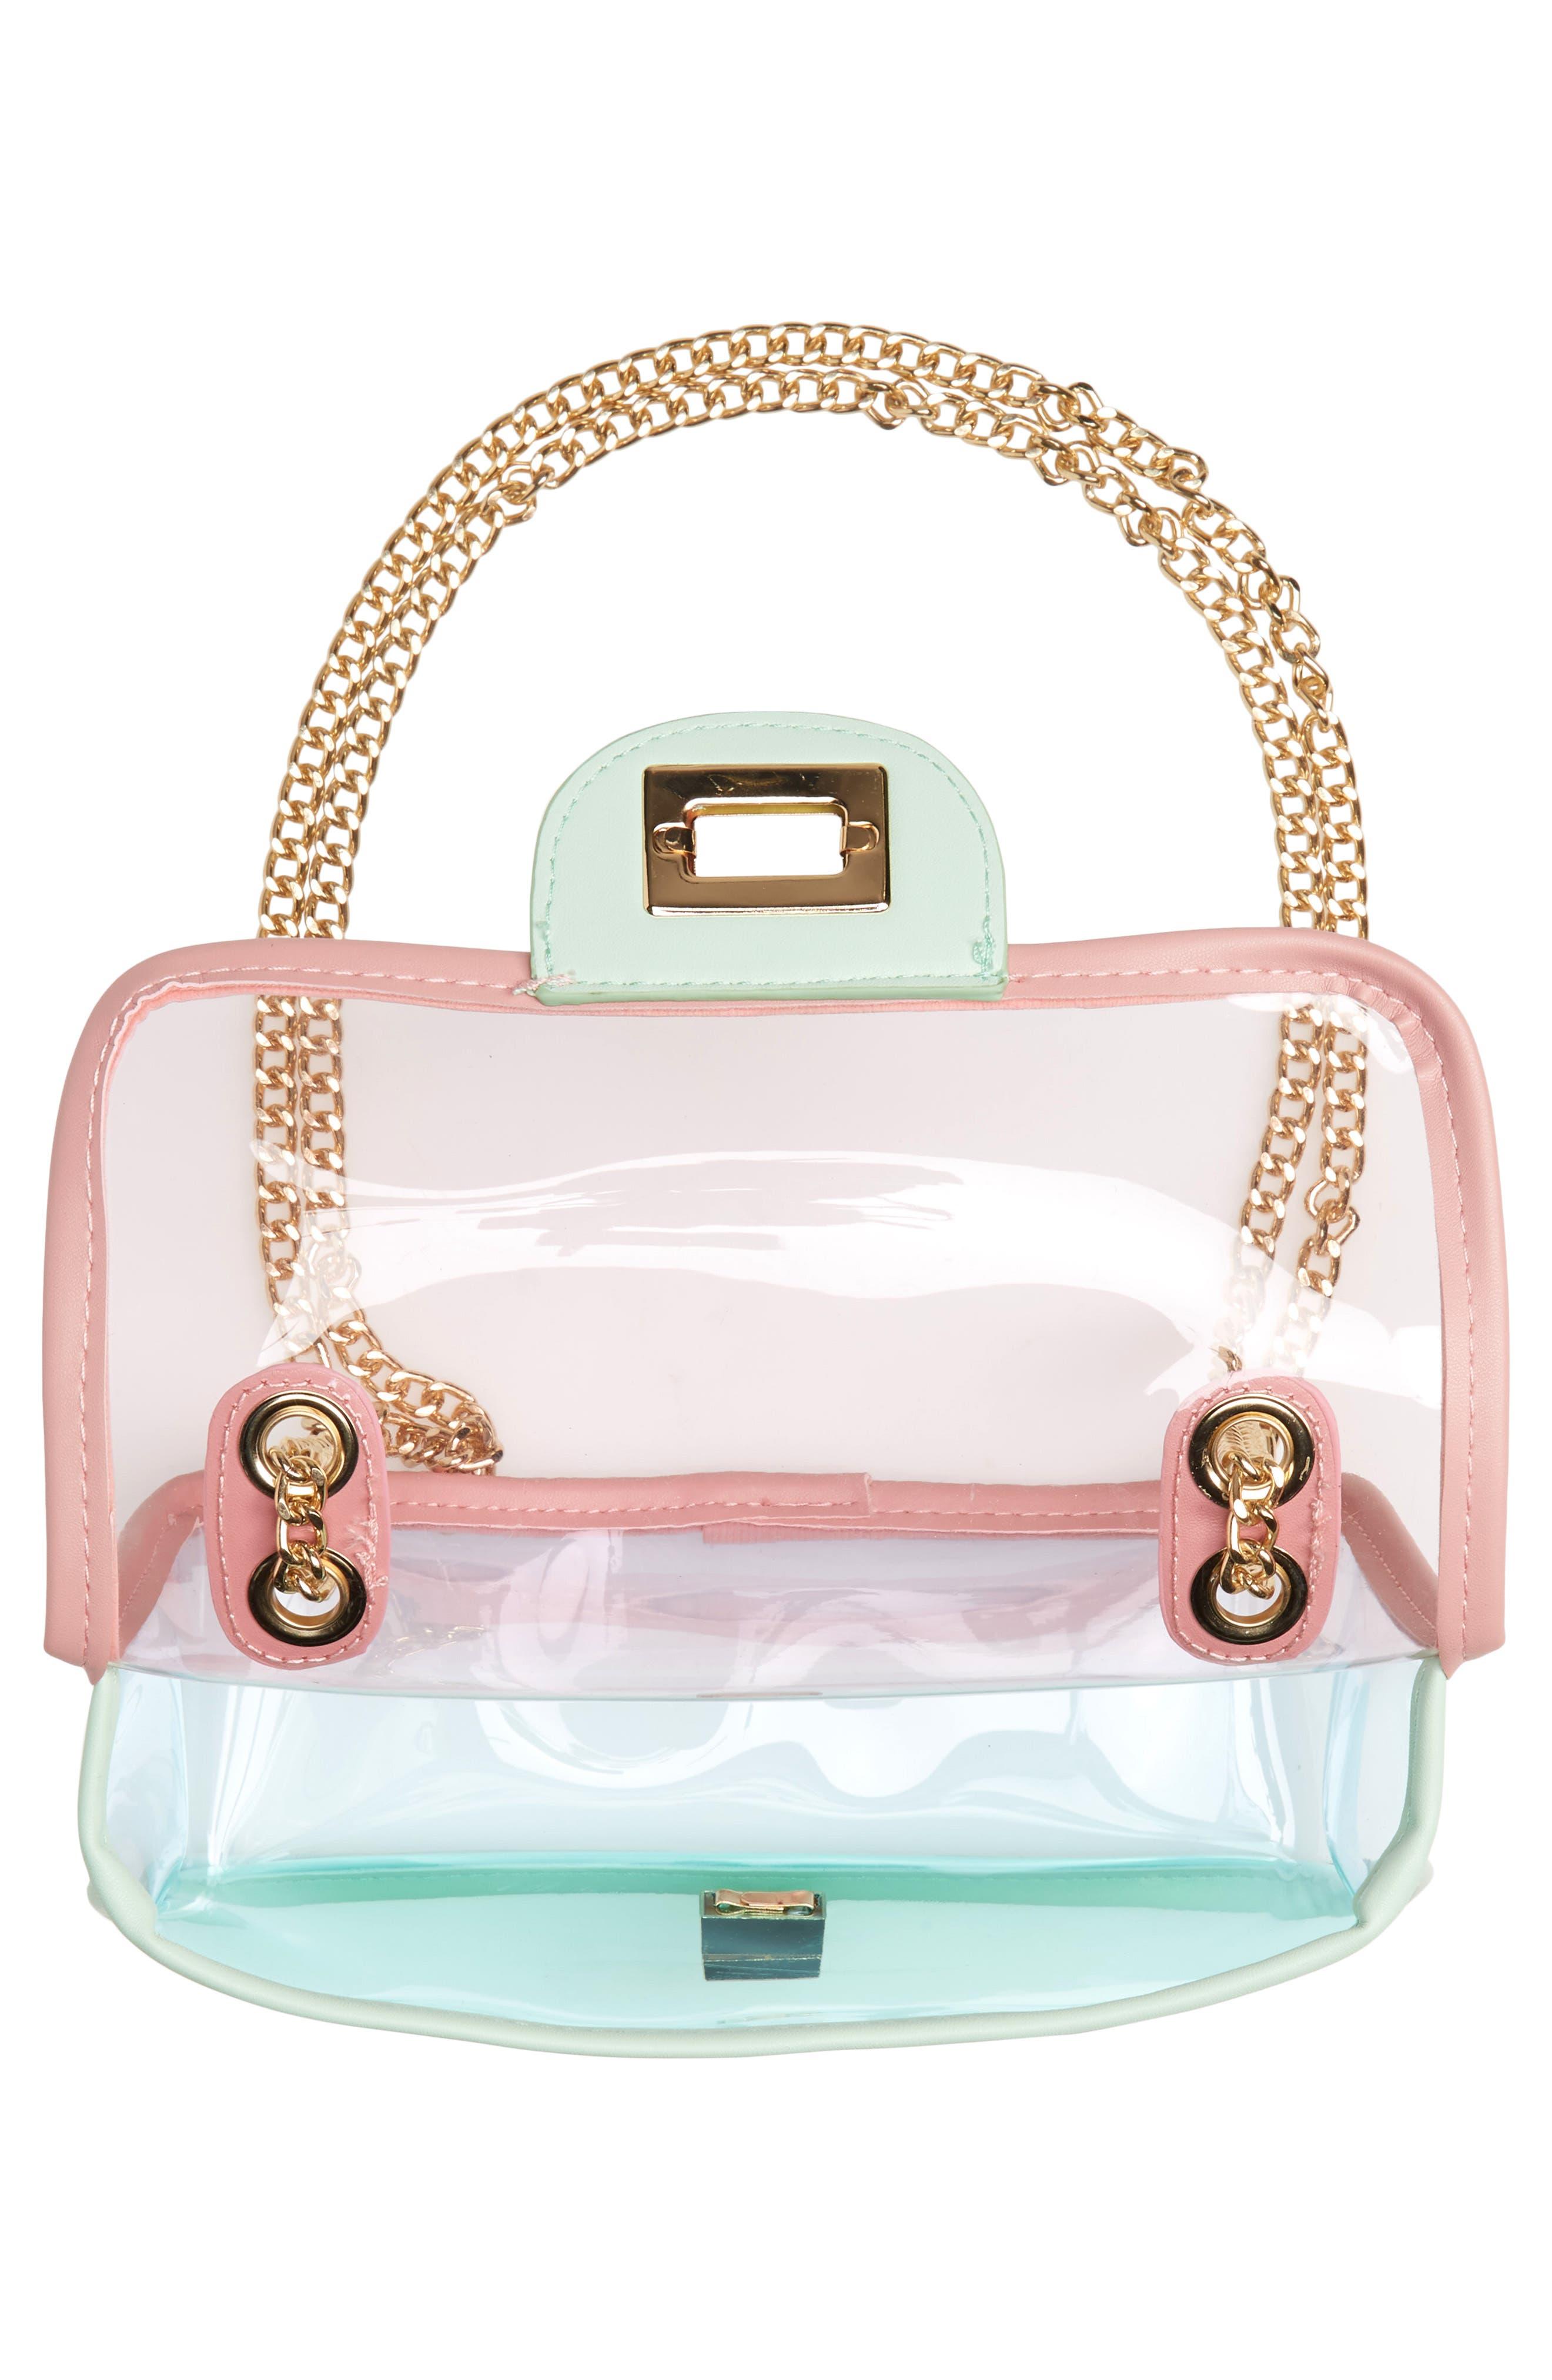 JANE & BERRY, Transparent Crossbody Bag, Alternate thumbnail 6, color, PINK MULTI